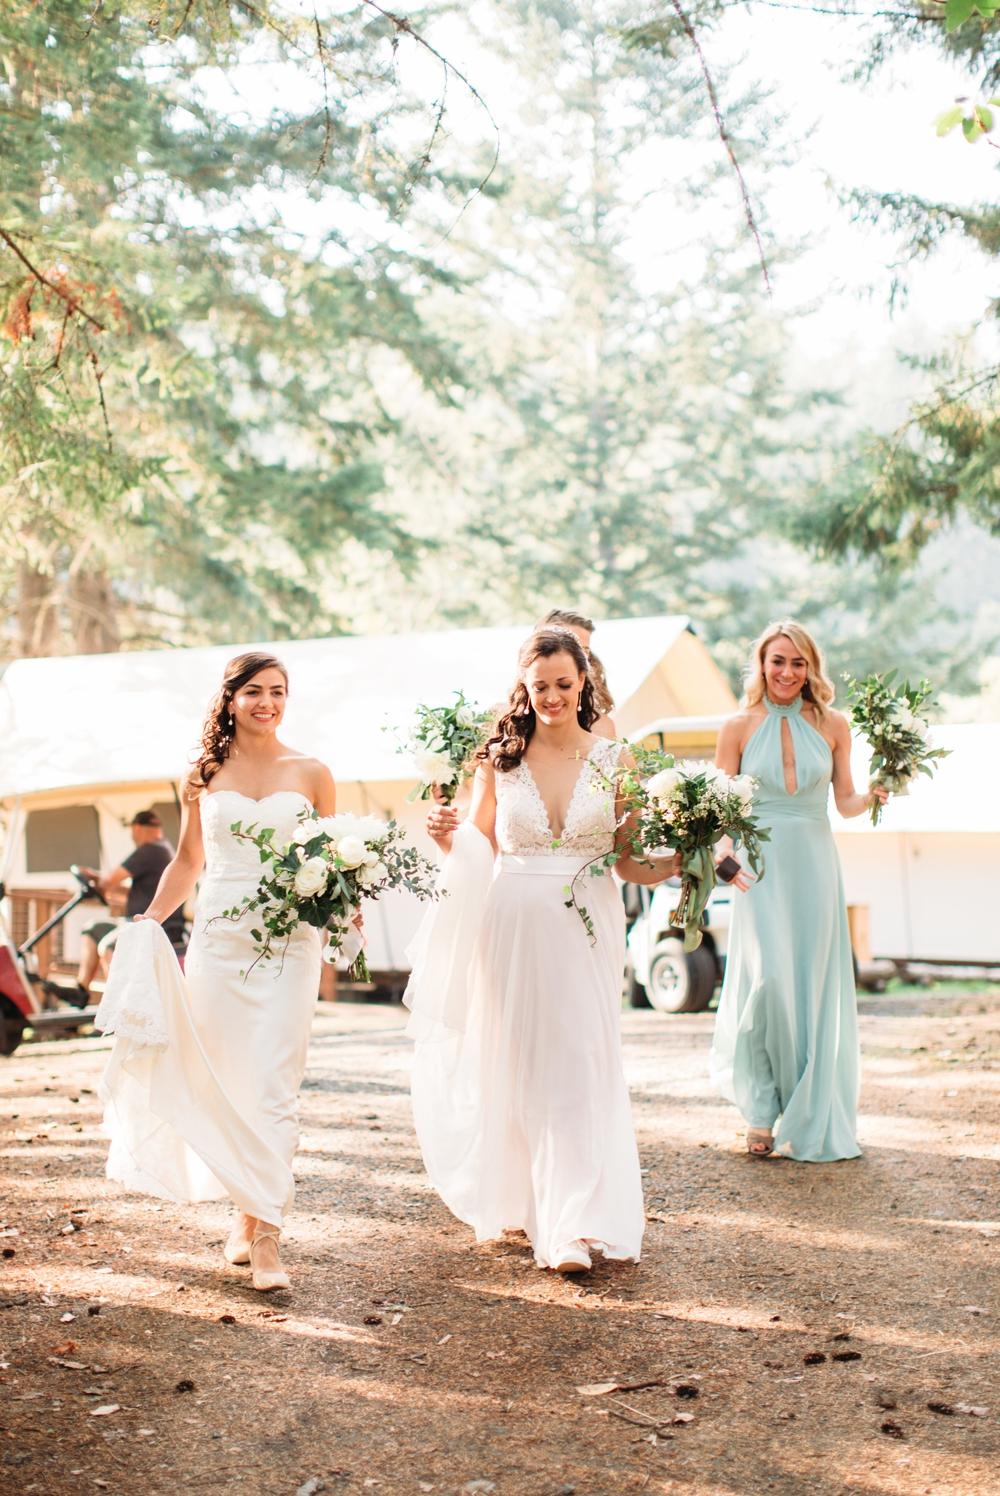 brides-approach-wedding-site